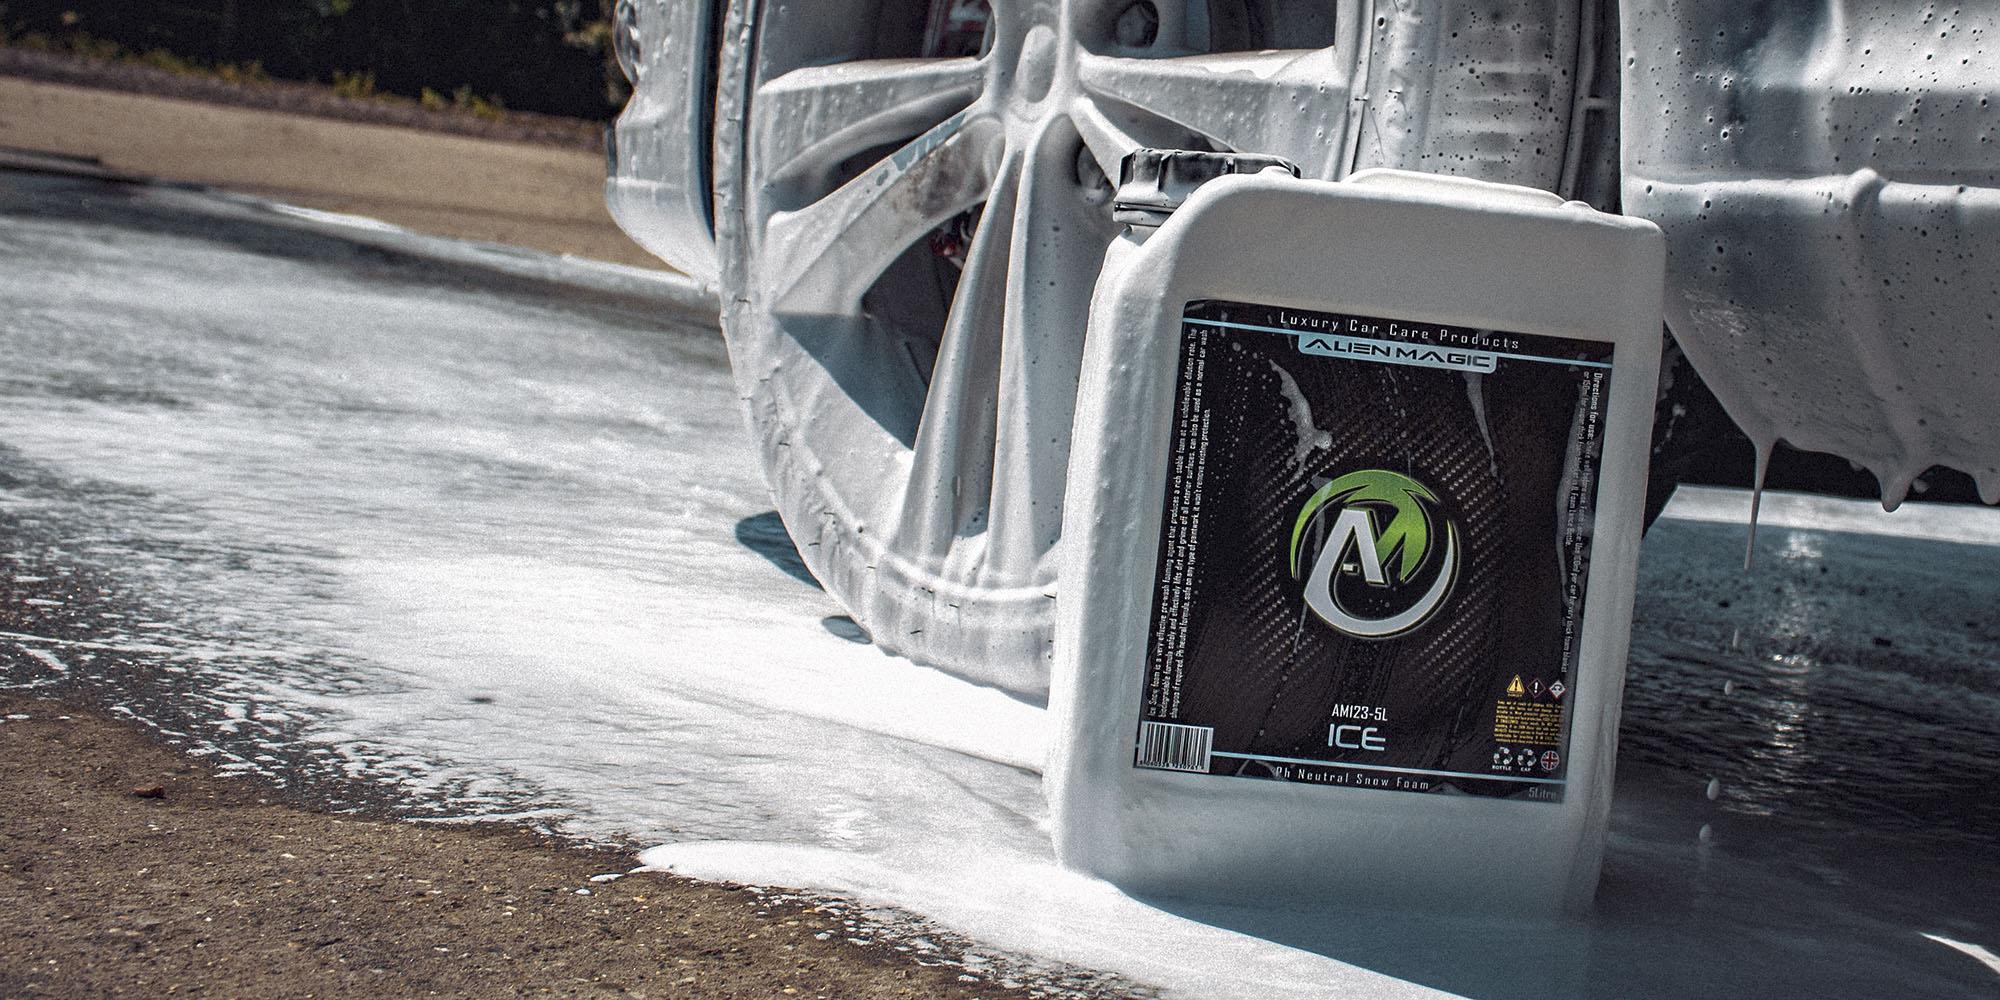 Ice pH neutral Snow Foam Alien Magic Luxembourg